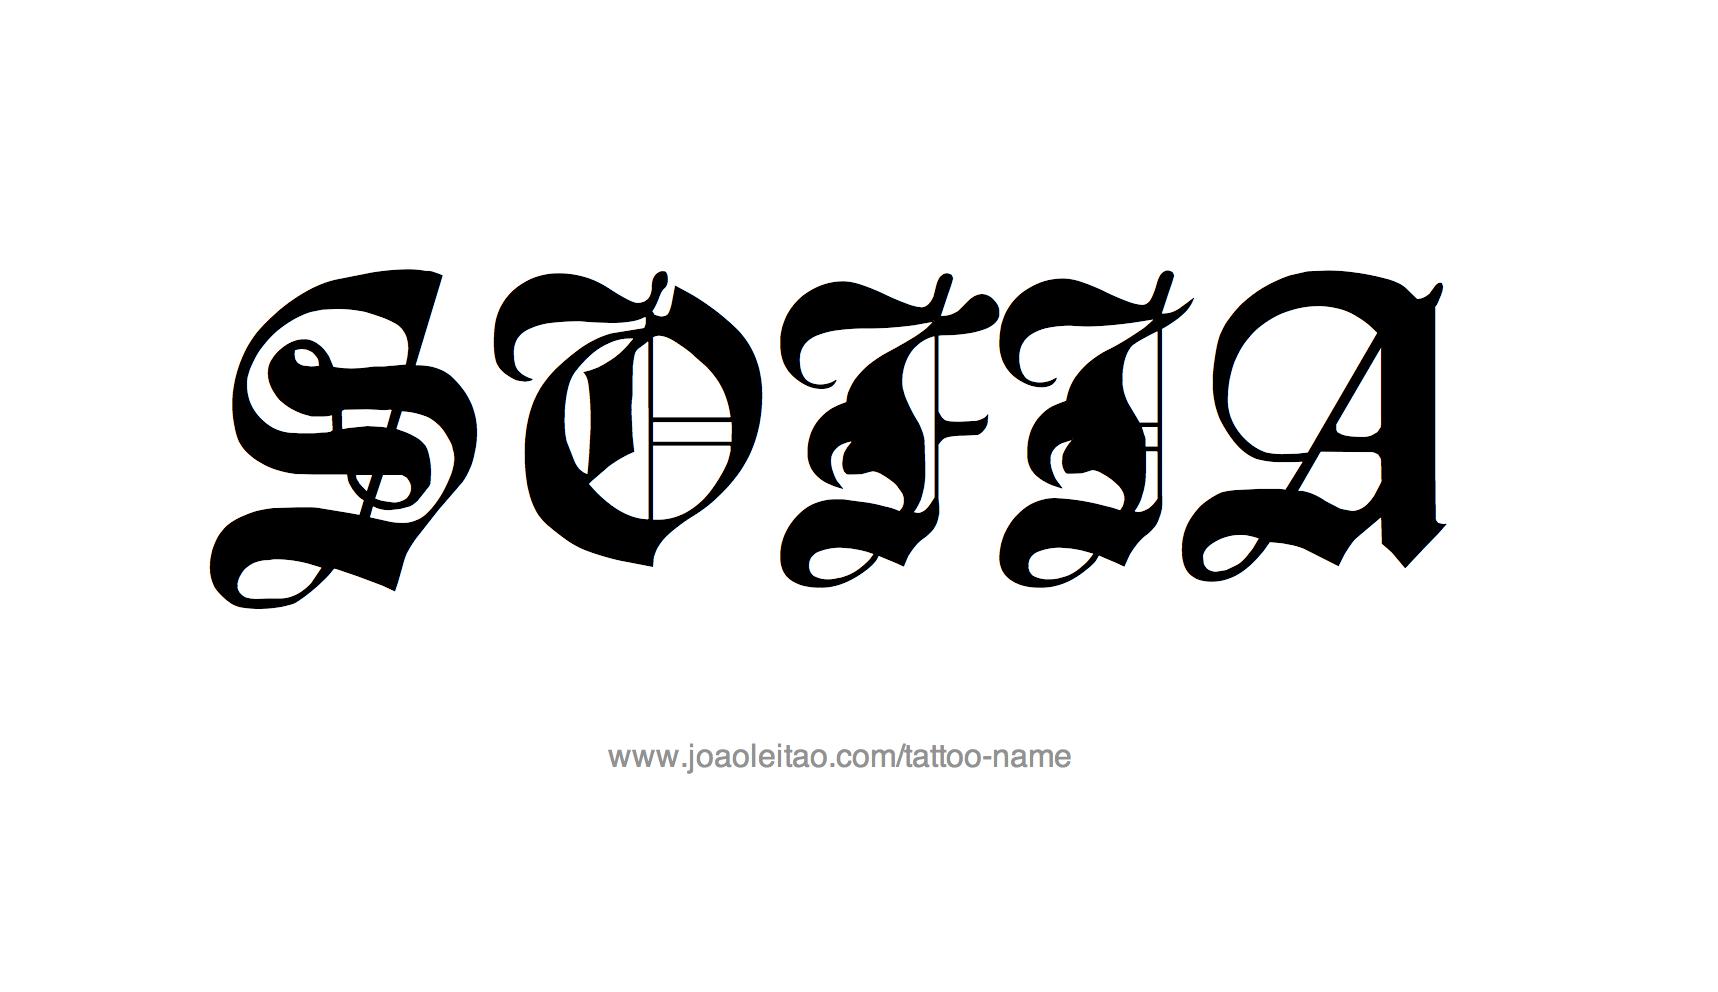 Sofia Name Tattoo Designs : tattoo design female name sofia2021 from www.joaoleitao.com size 1718 x 992 png 94kB